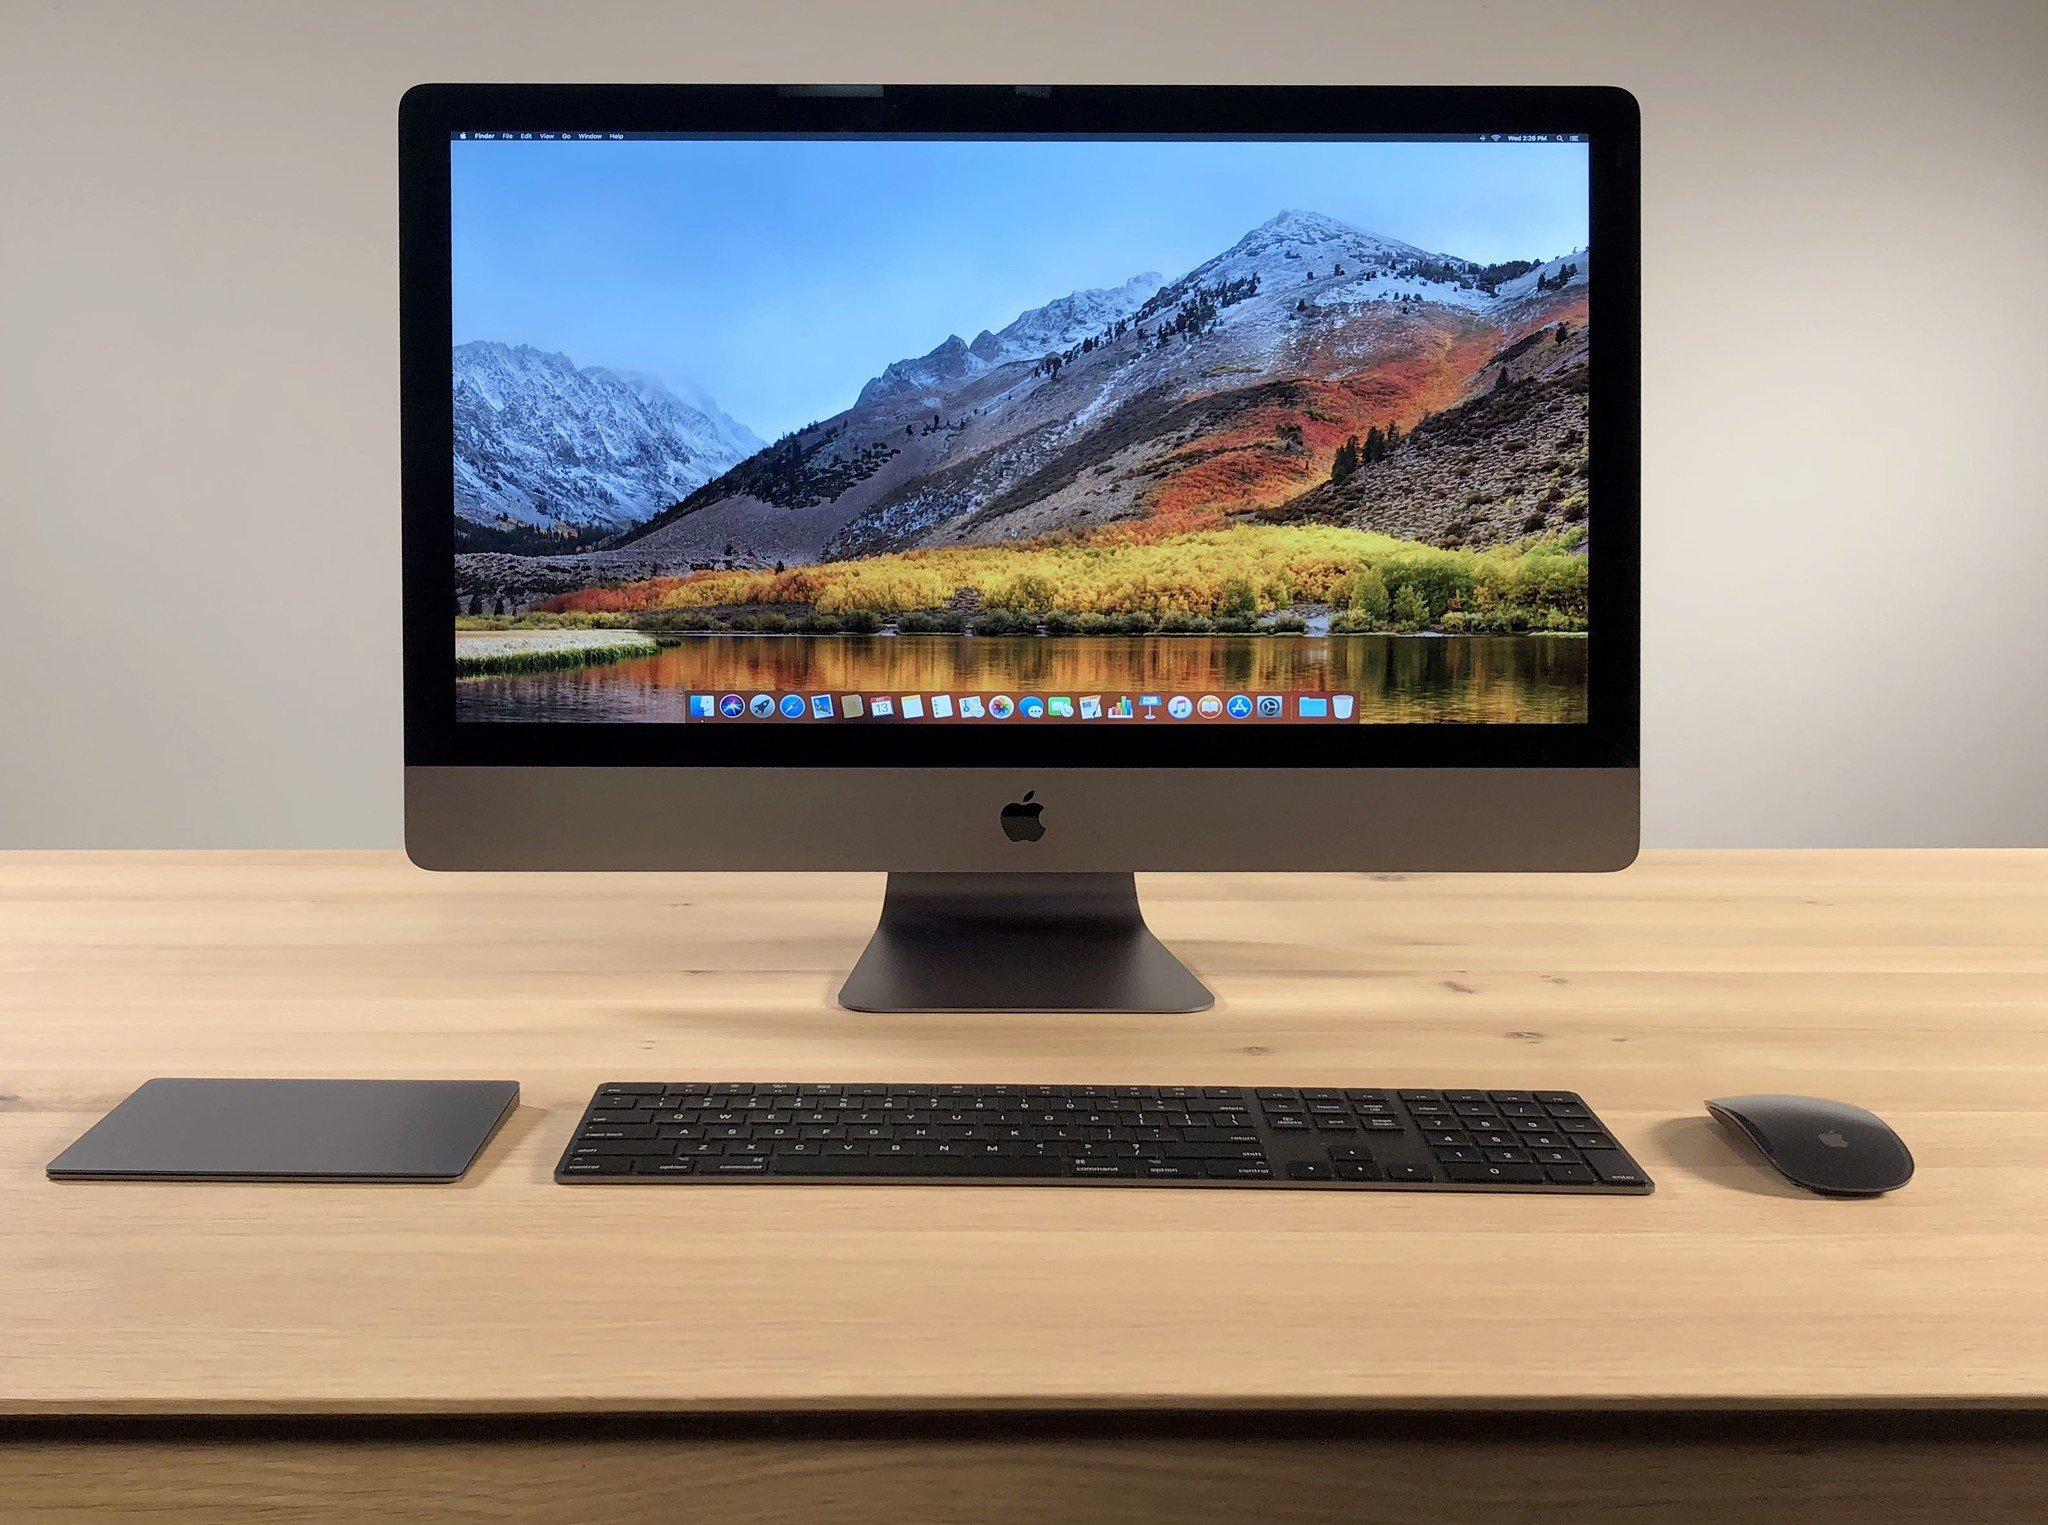 Mac Mini . Imac Pro Apple